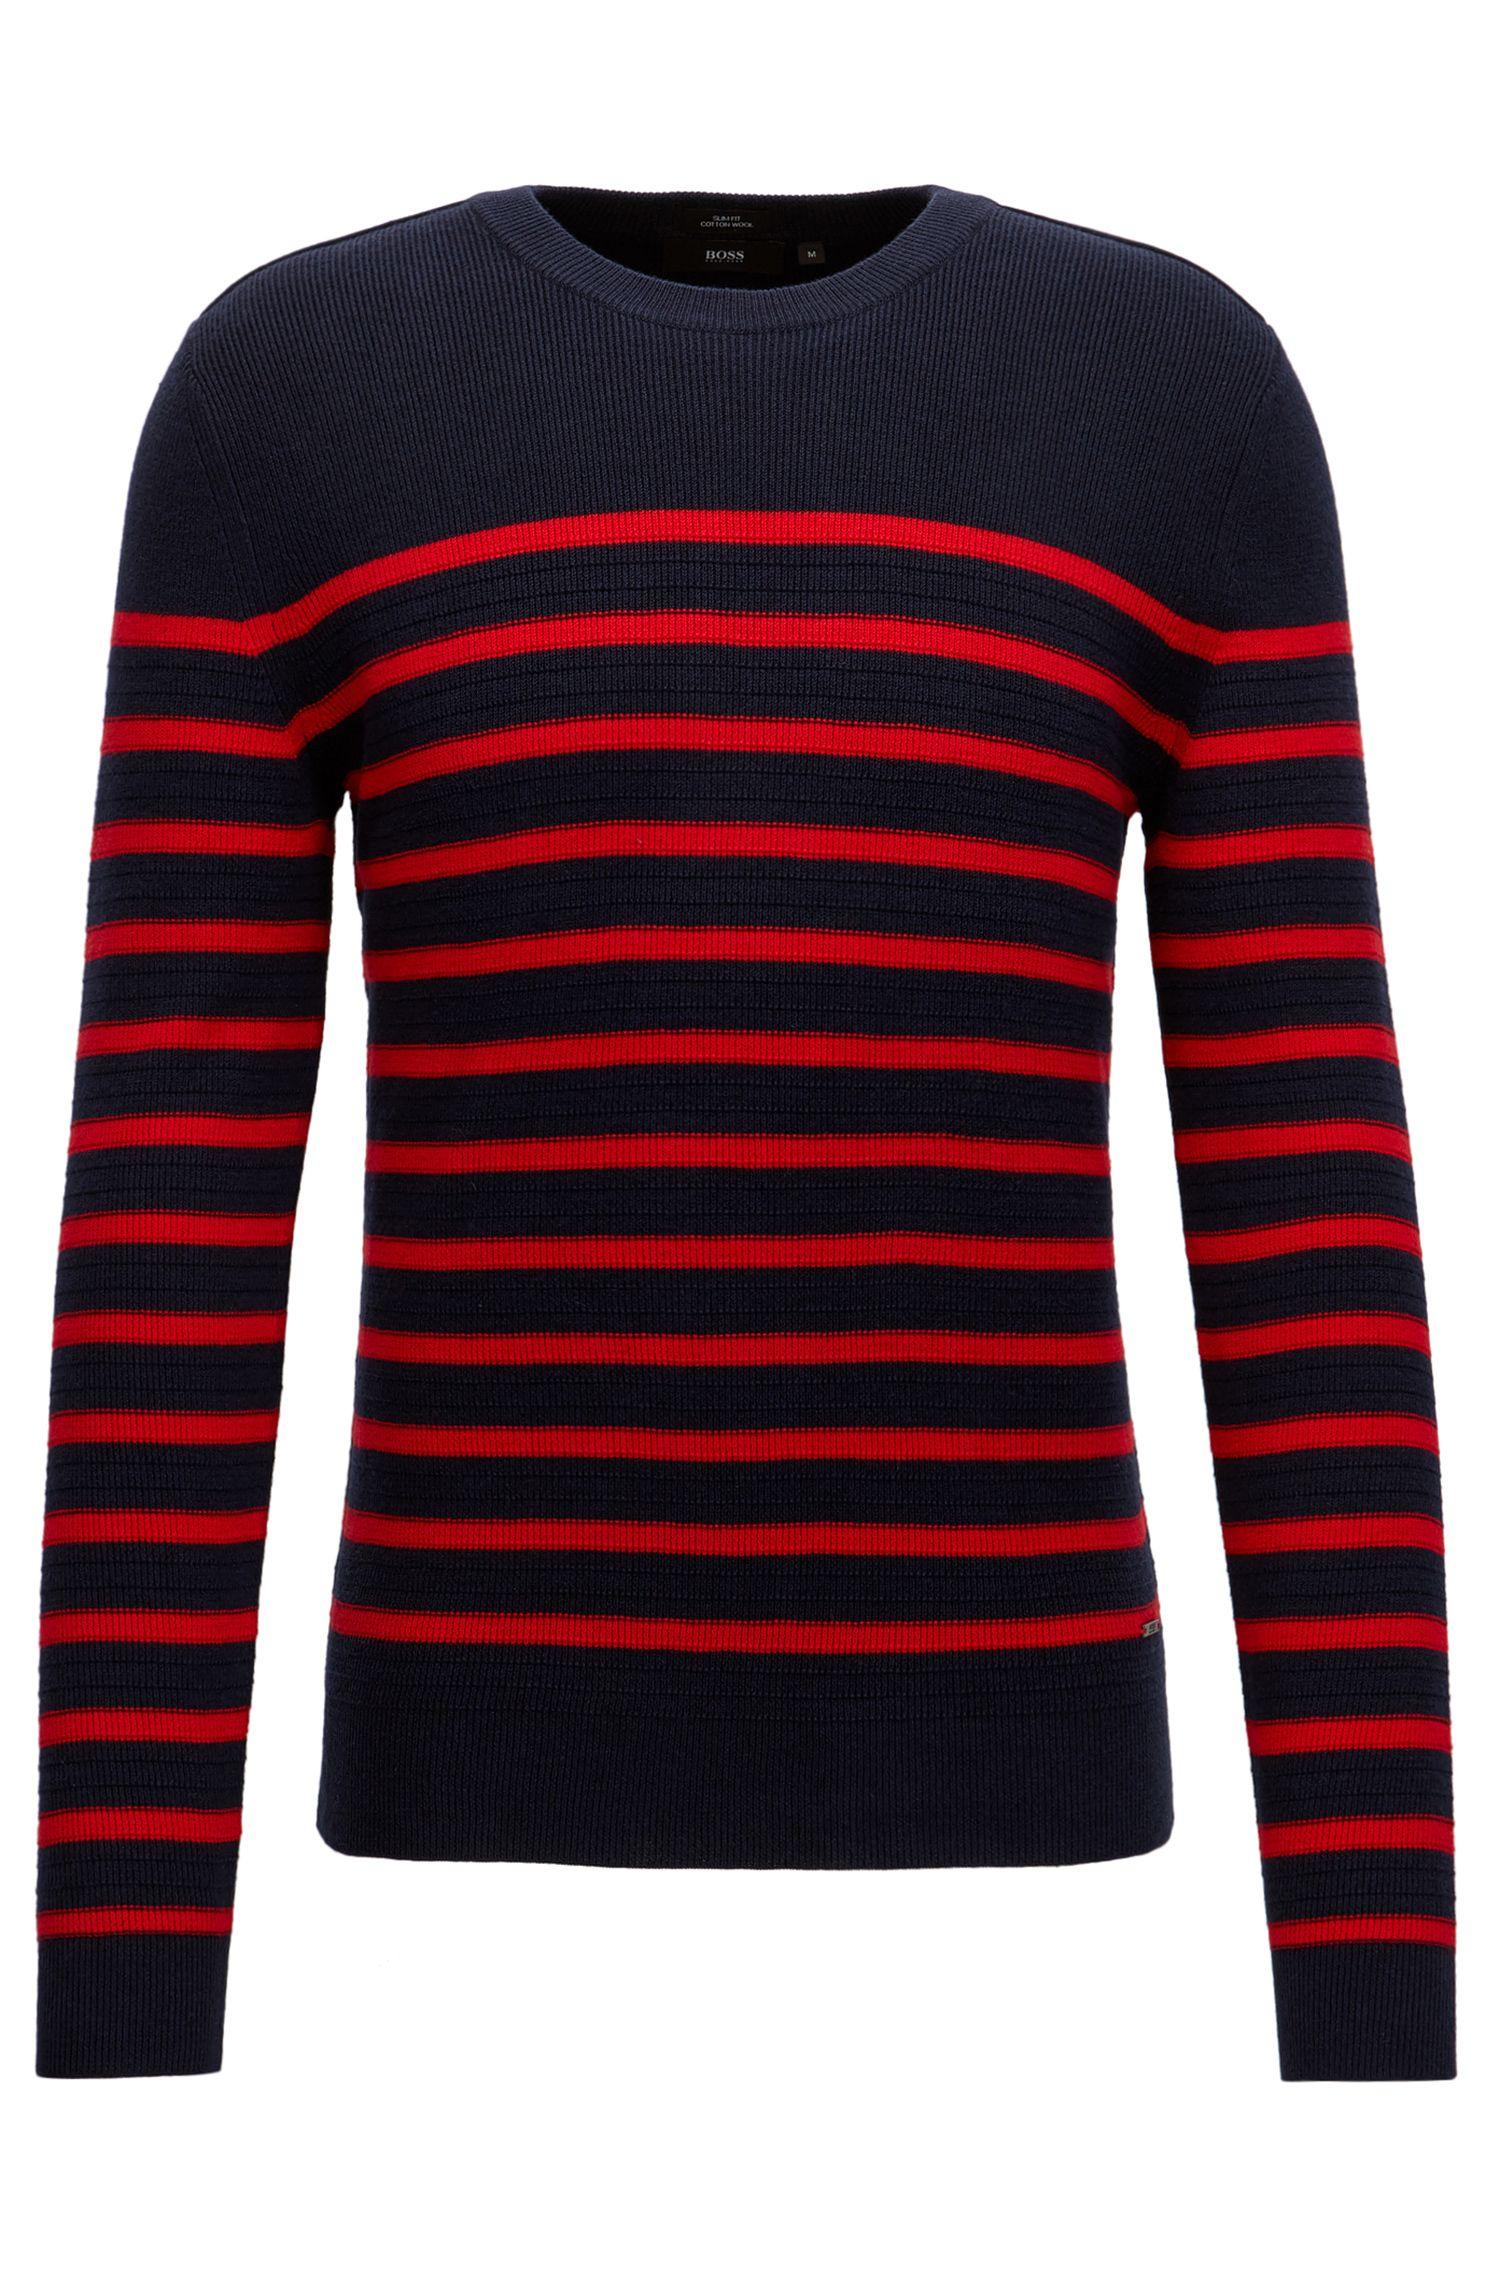 'Naone' | Cotton Virgin Wool Sweater